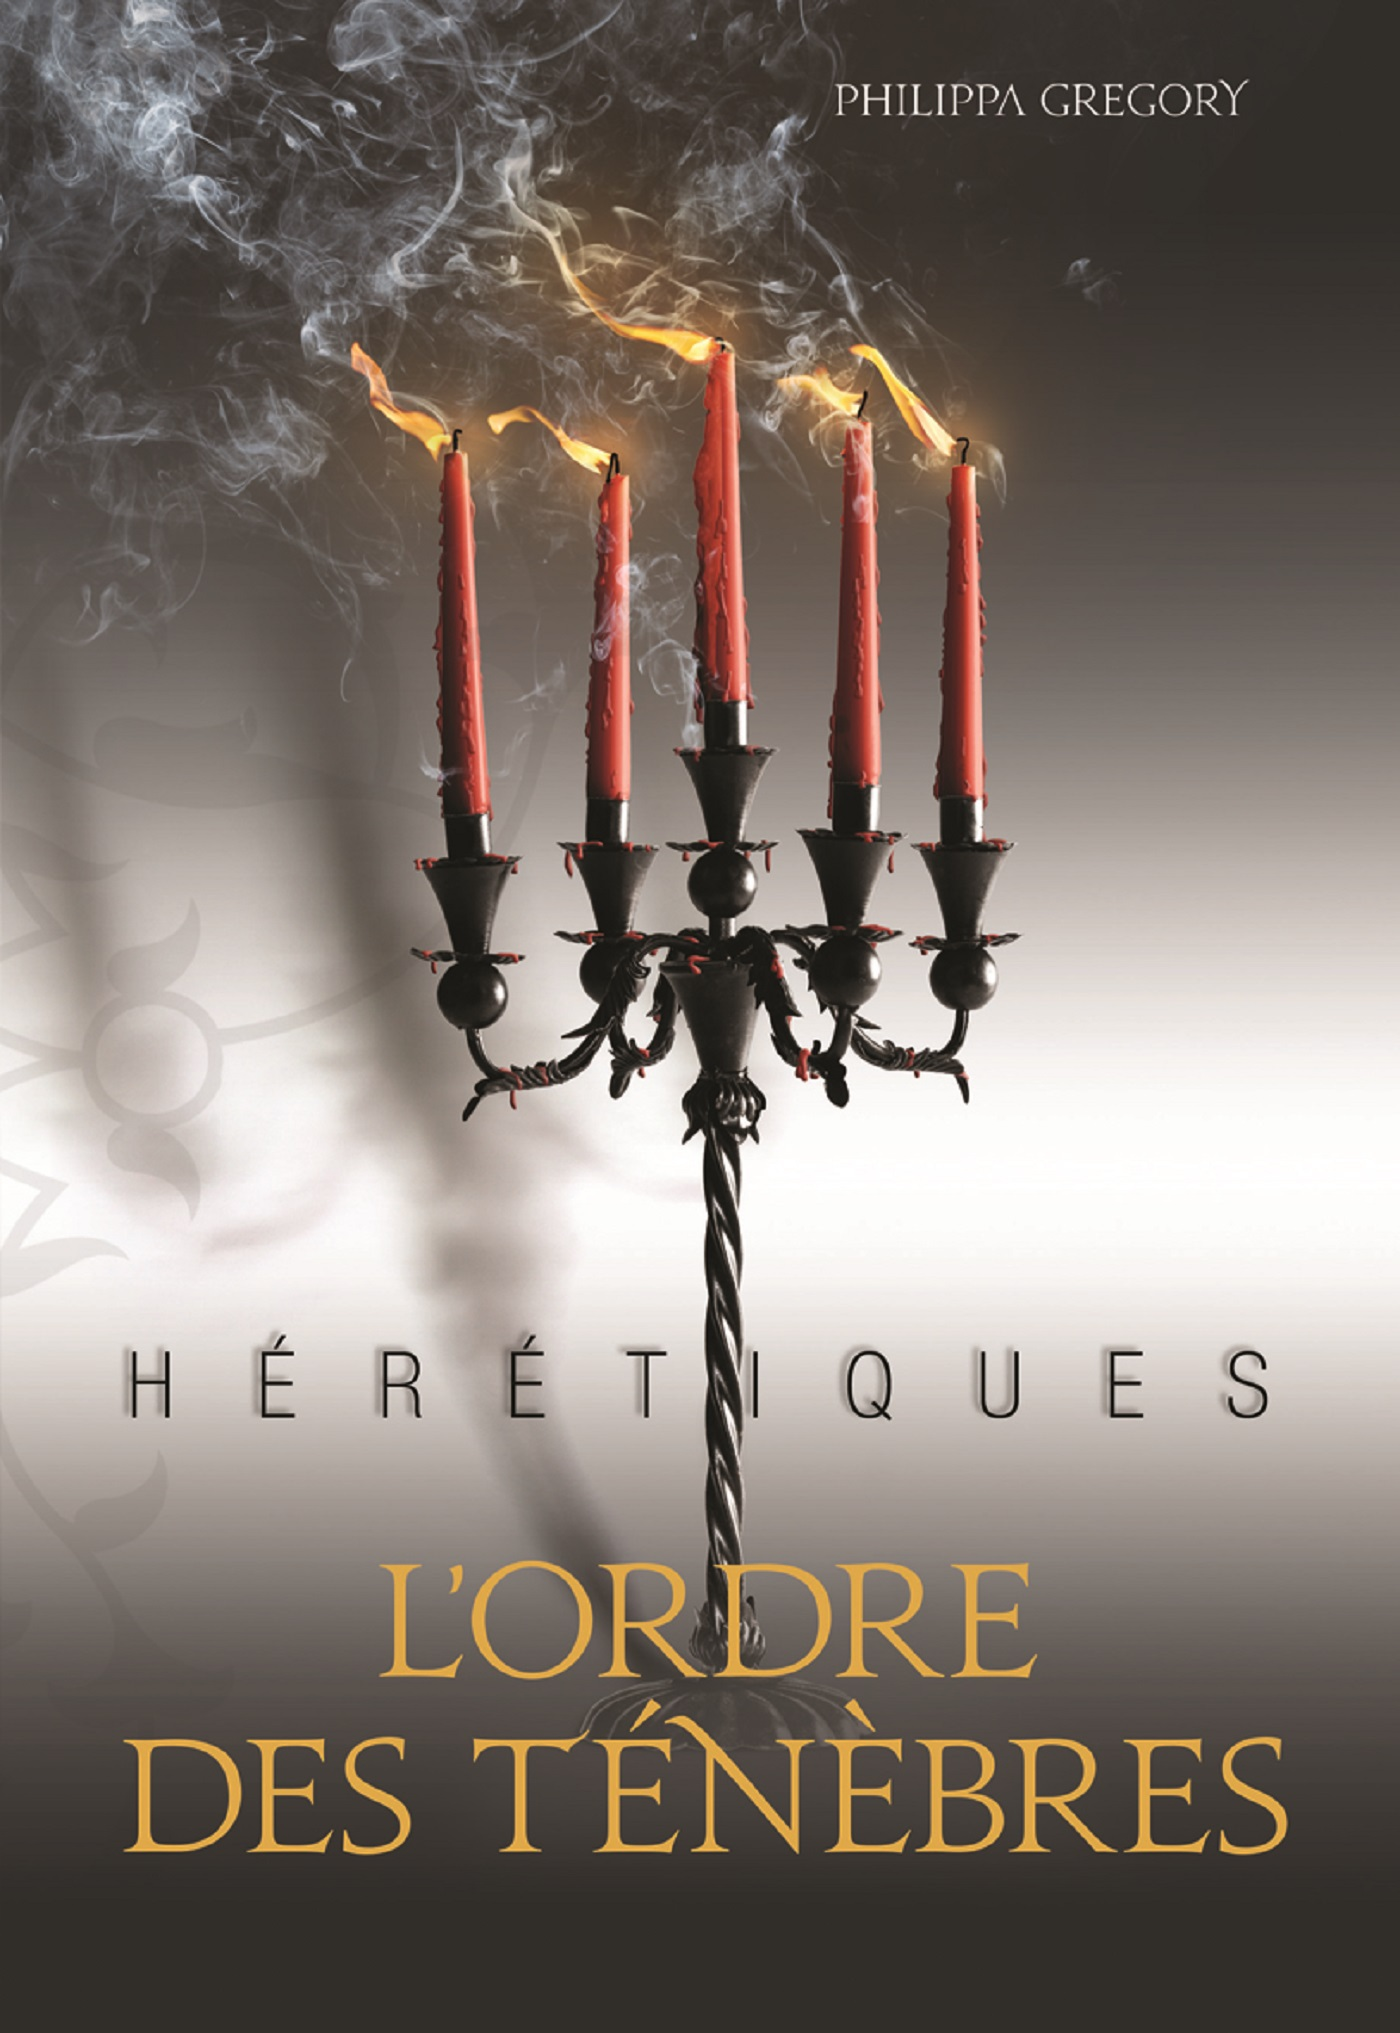 Hérétiques (Tome 2) - L'ordre des Ténèbres